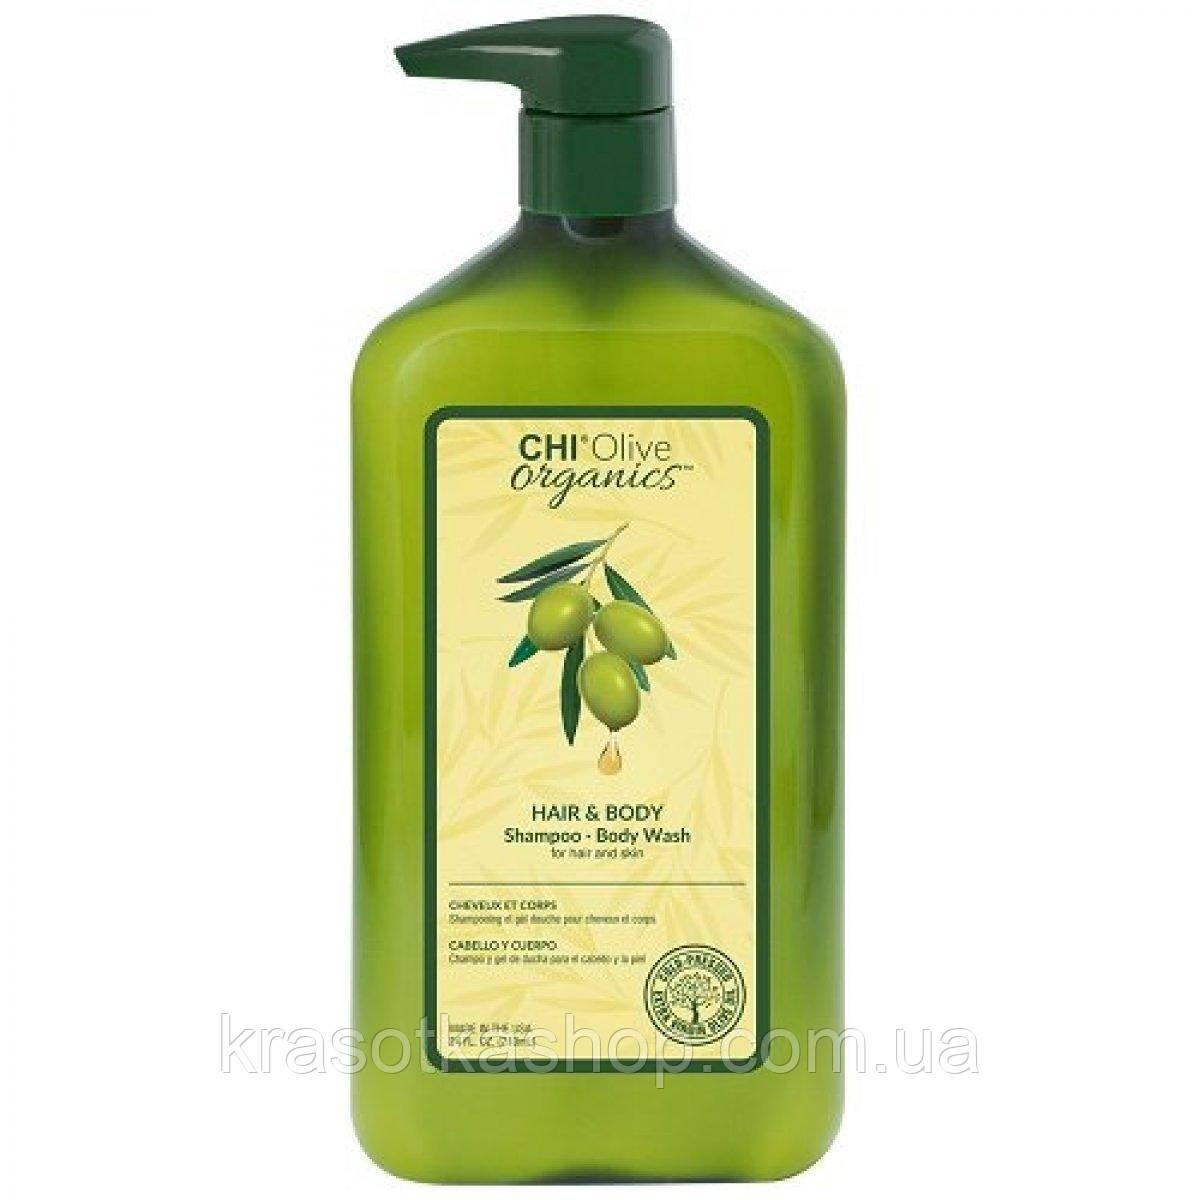 Кондиционер на основе оливкового масла Chi Olive Organics Hair And Body Conditioner 710 мл